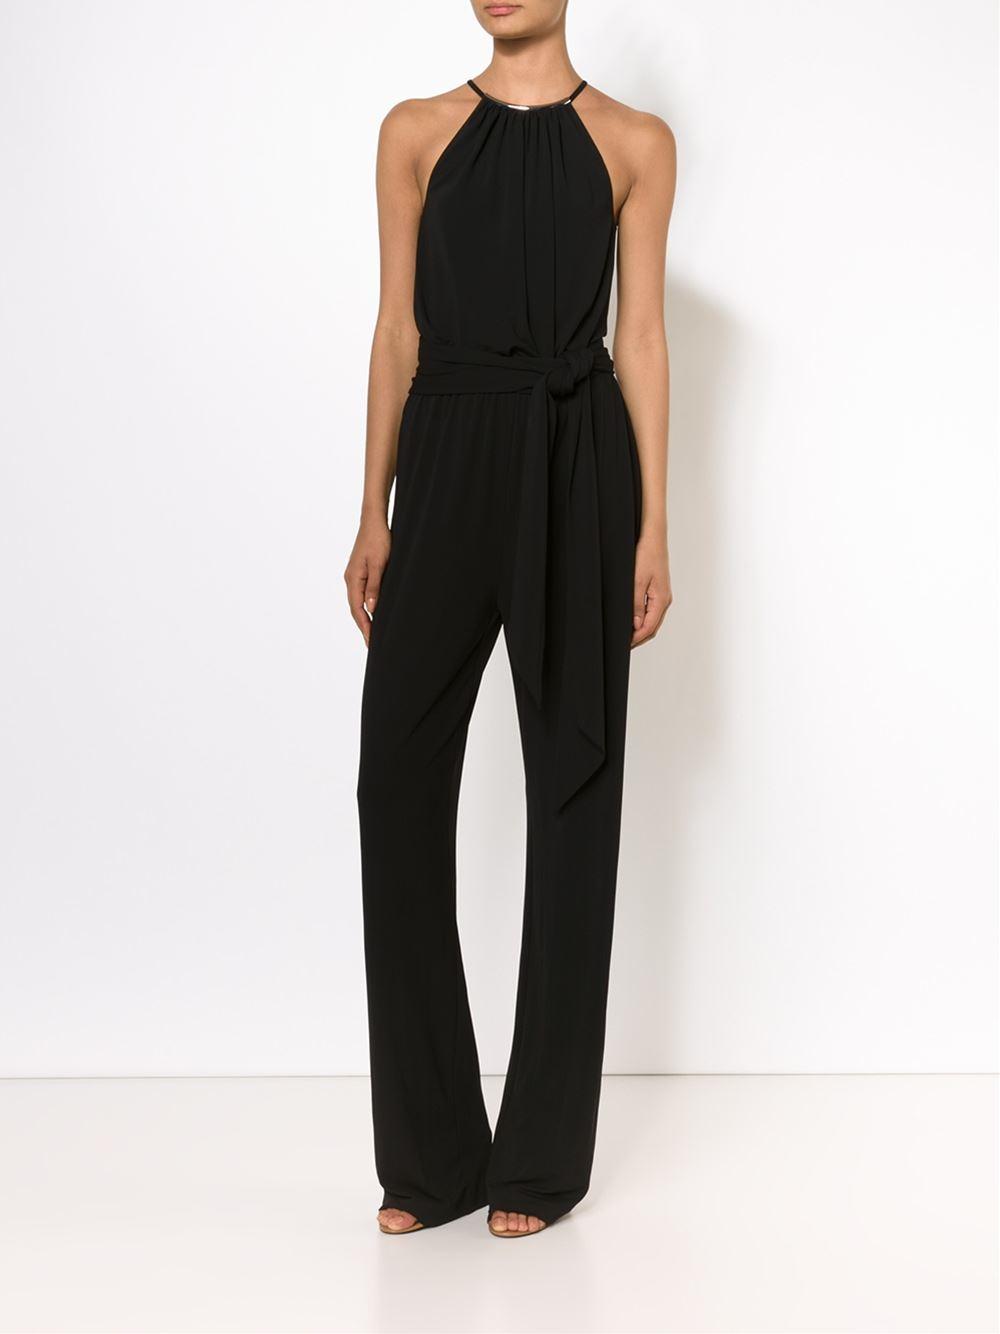 michael kors sleeveless jumpsuit in black lyst. Black Bedroom Furniture Sets. Home Design Ideas